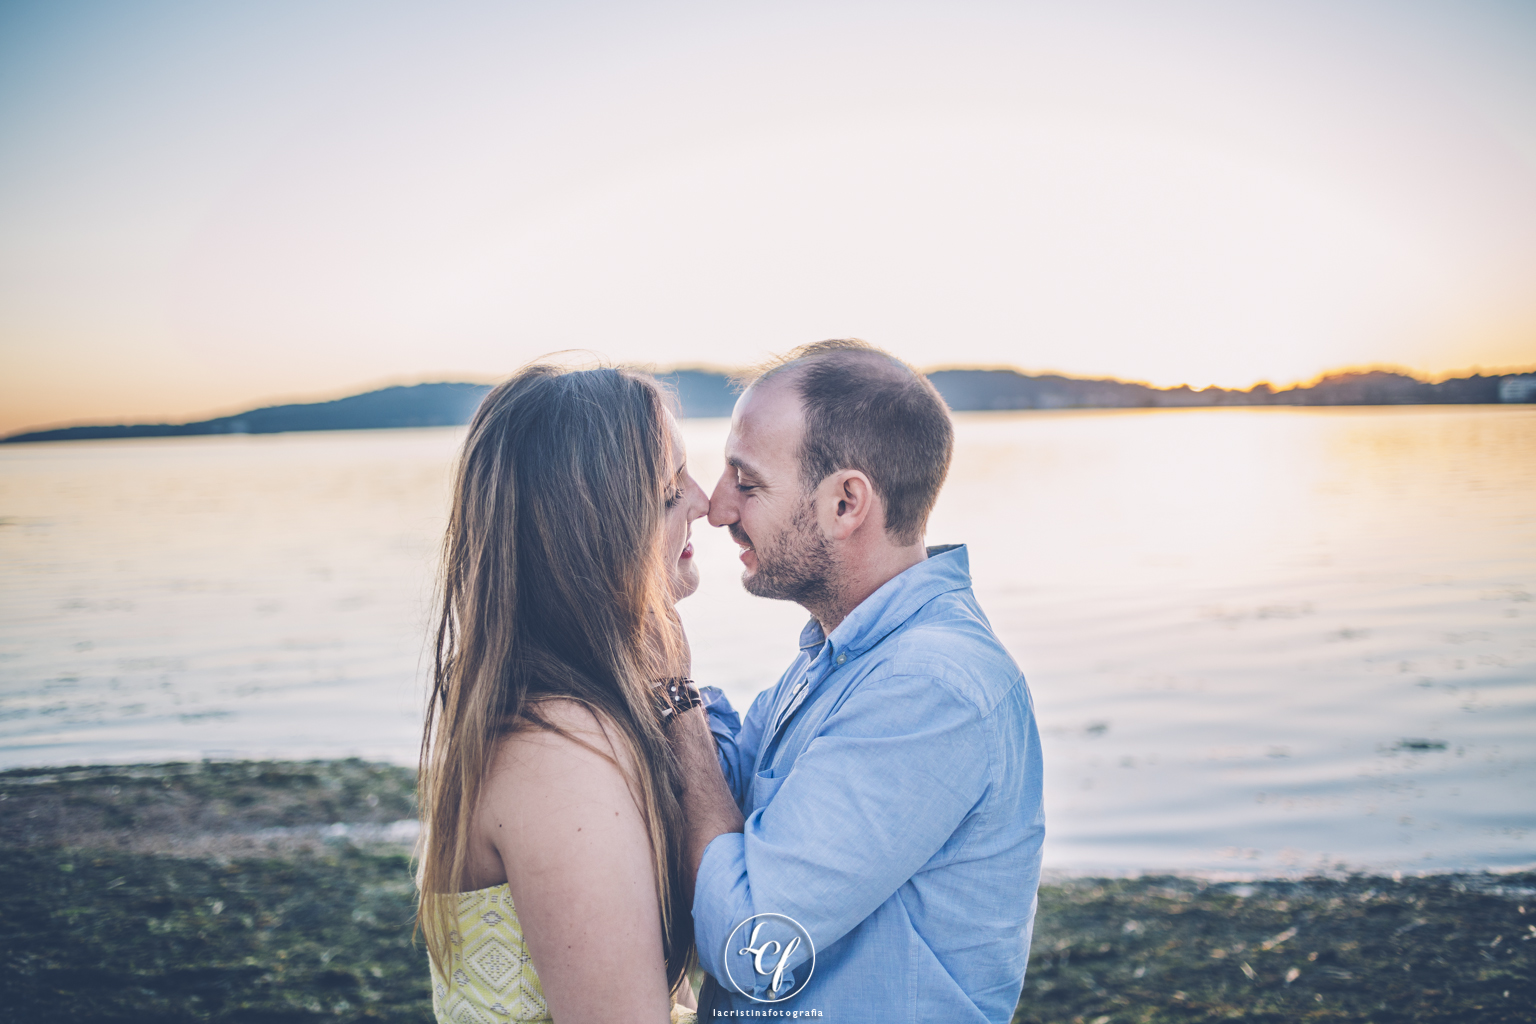 fotógrafo de pareja :: fotógrafo preboda :: fotógrafo de bodas :: destiny wedding photographer :: fotógrafo pontevedra :: fotógrafo internacional de bodas